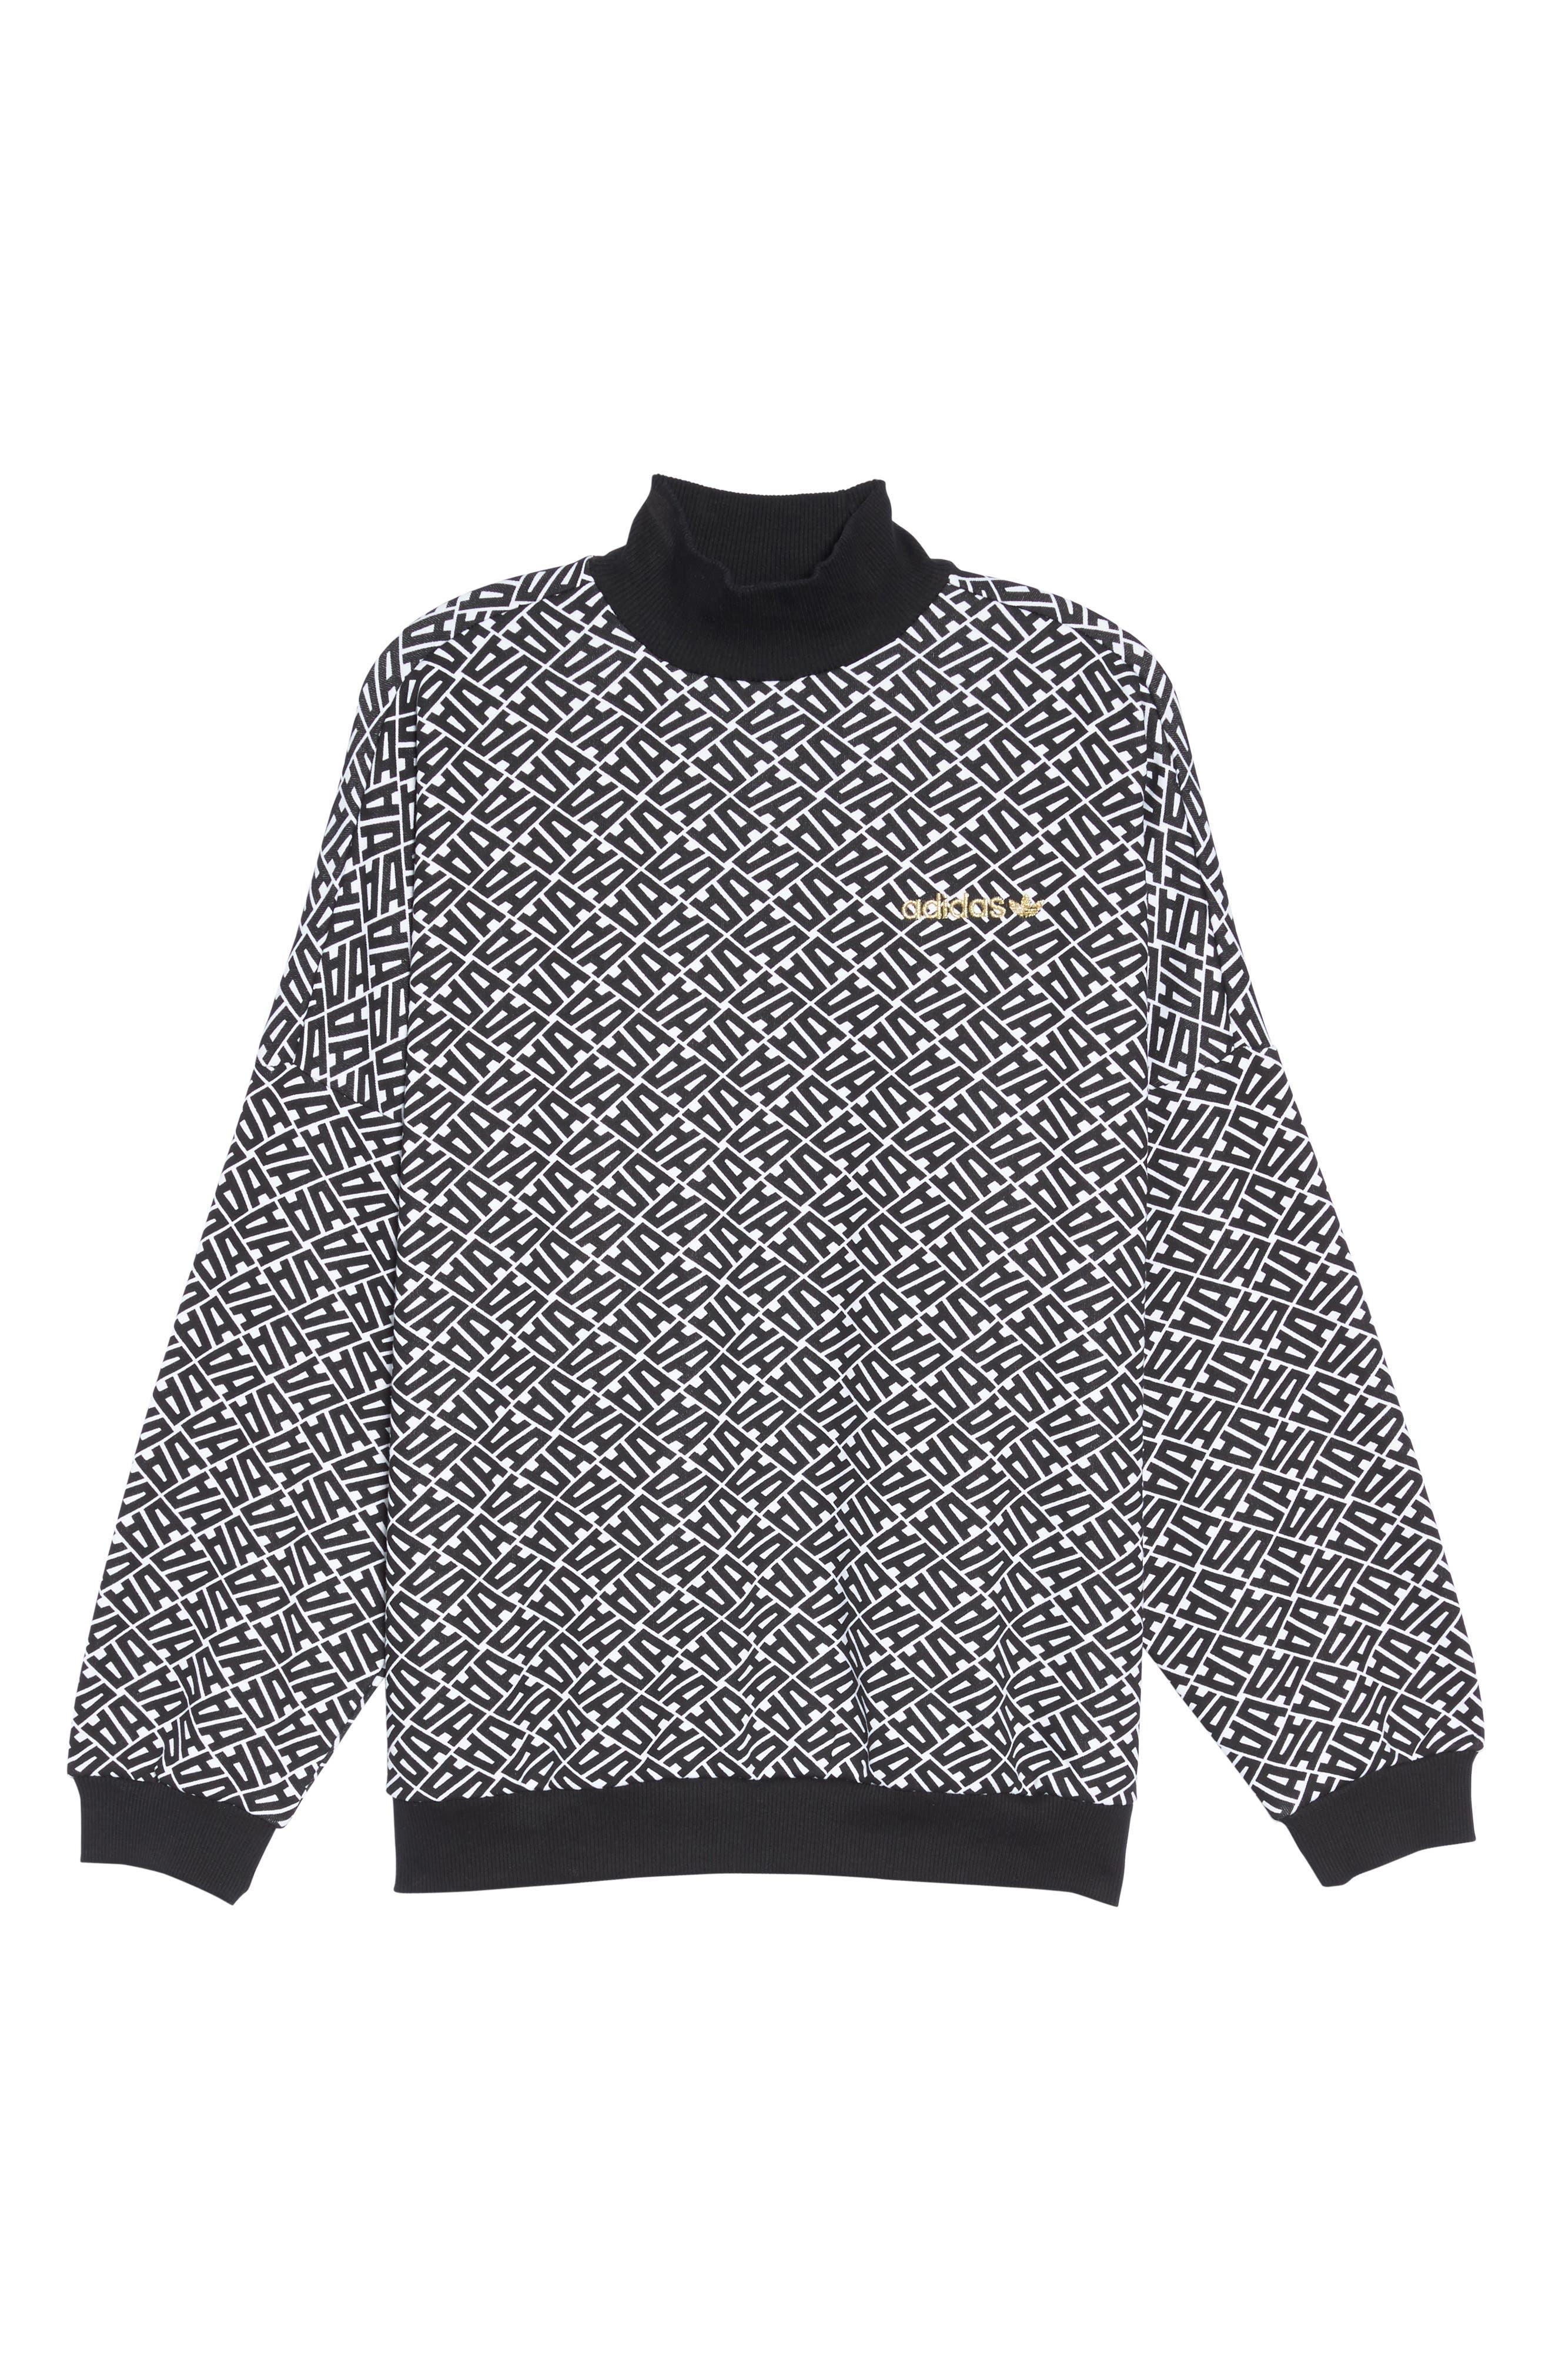 AOP Print Sweatshirt,                             Alternate thumbnail 7, color,                             001